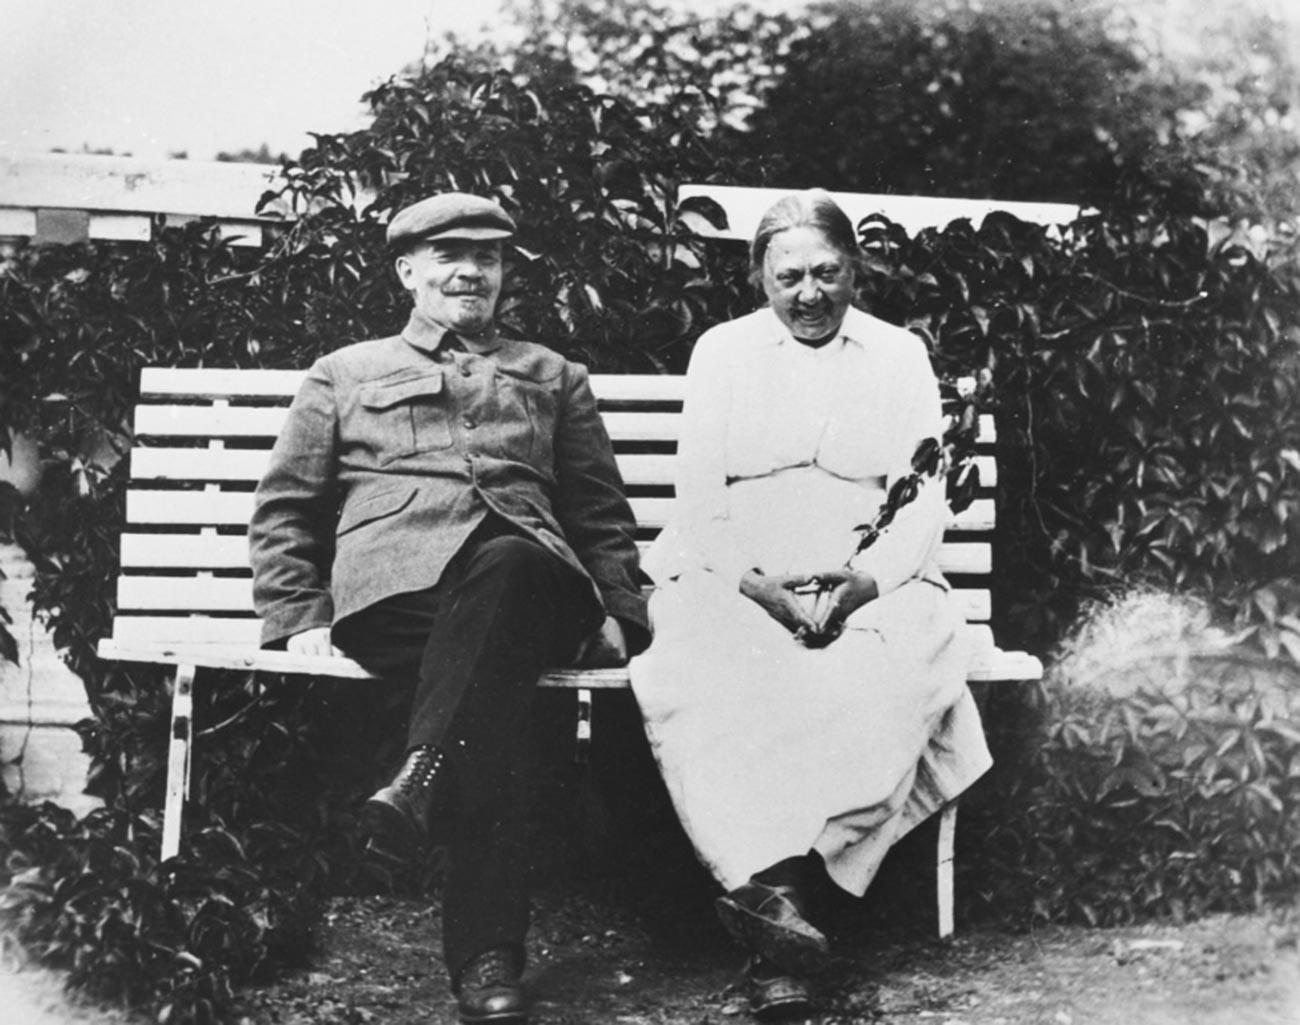 Vladimir Lénine et sa femme Nadejda Kroupskaïa à Leninskié Gorki